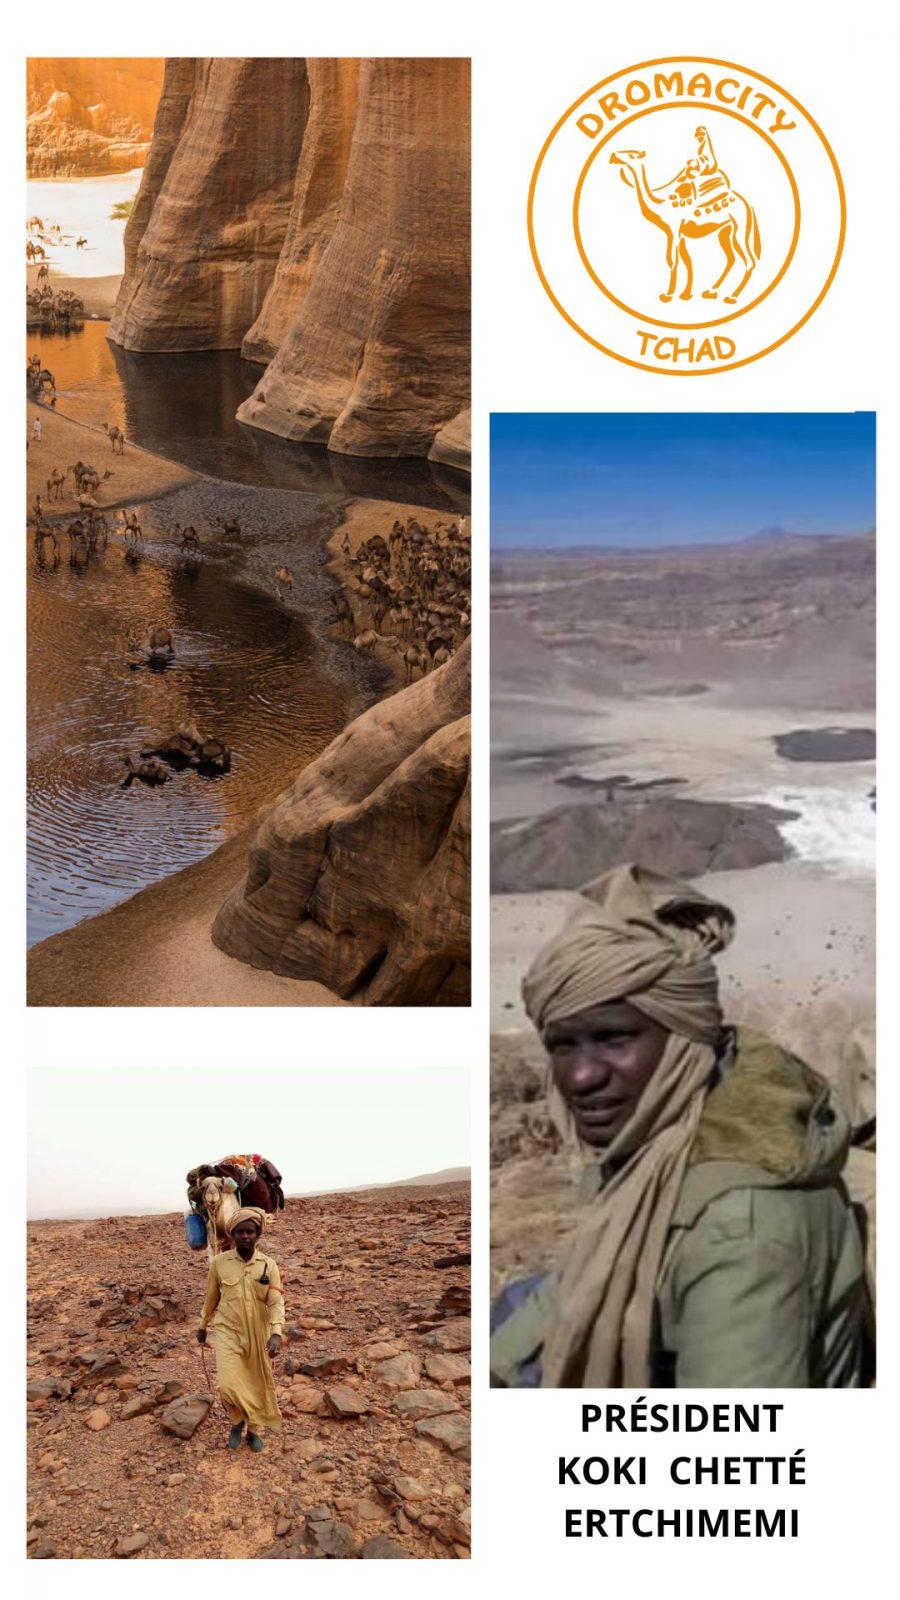 Tchad DromaCity